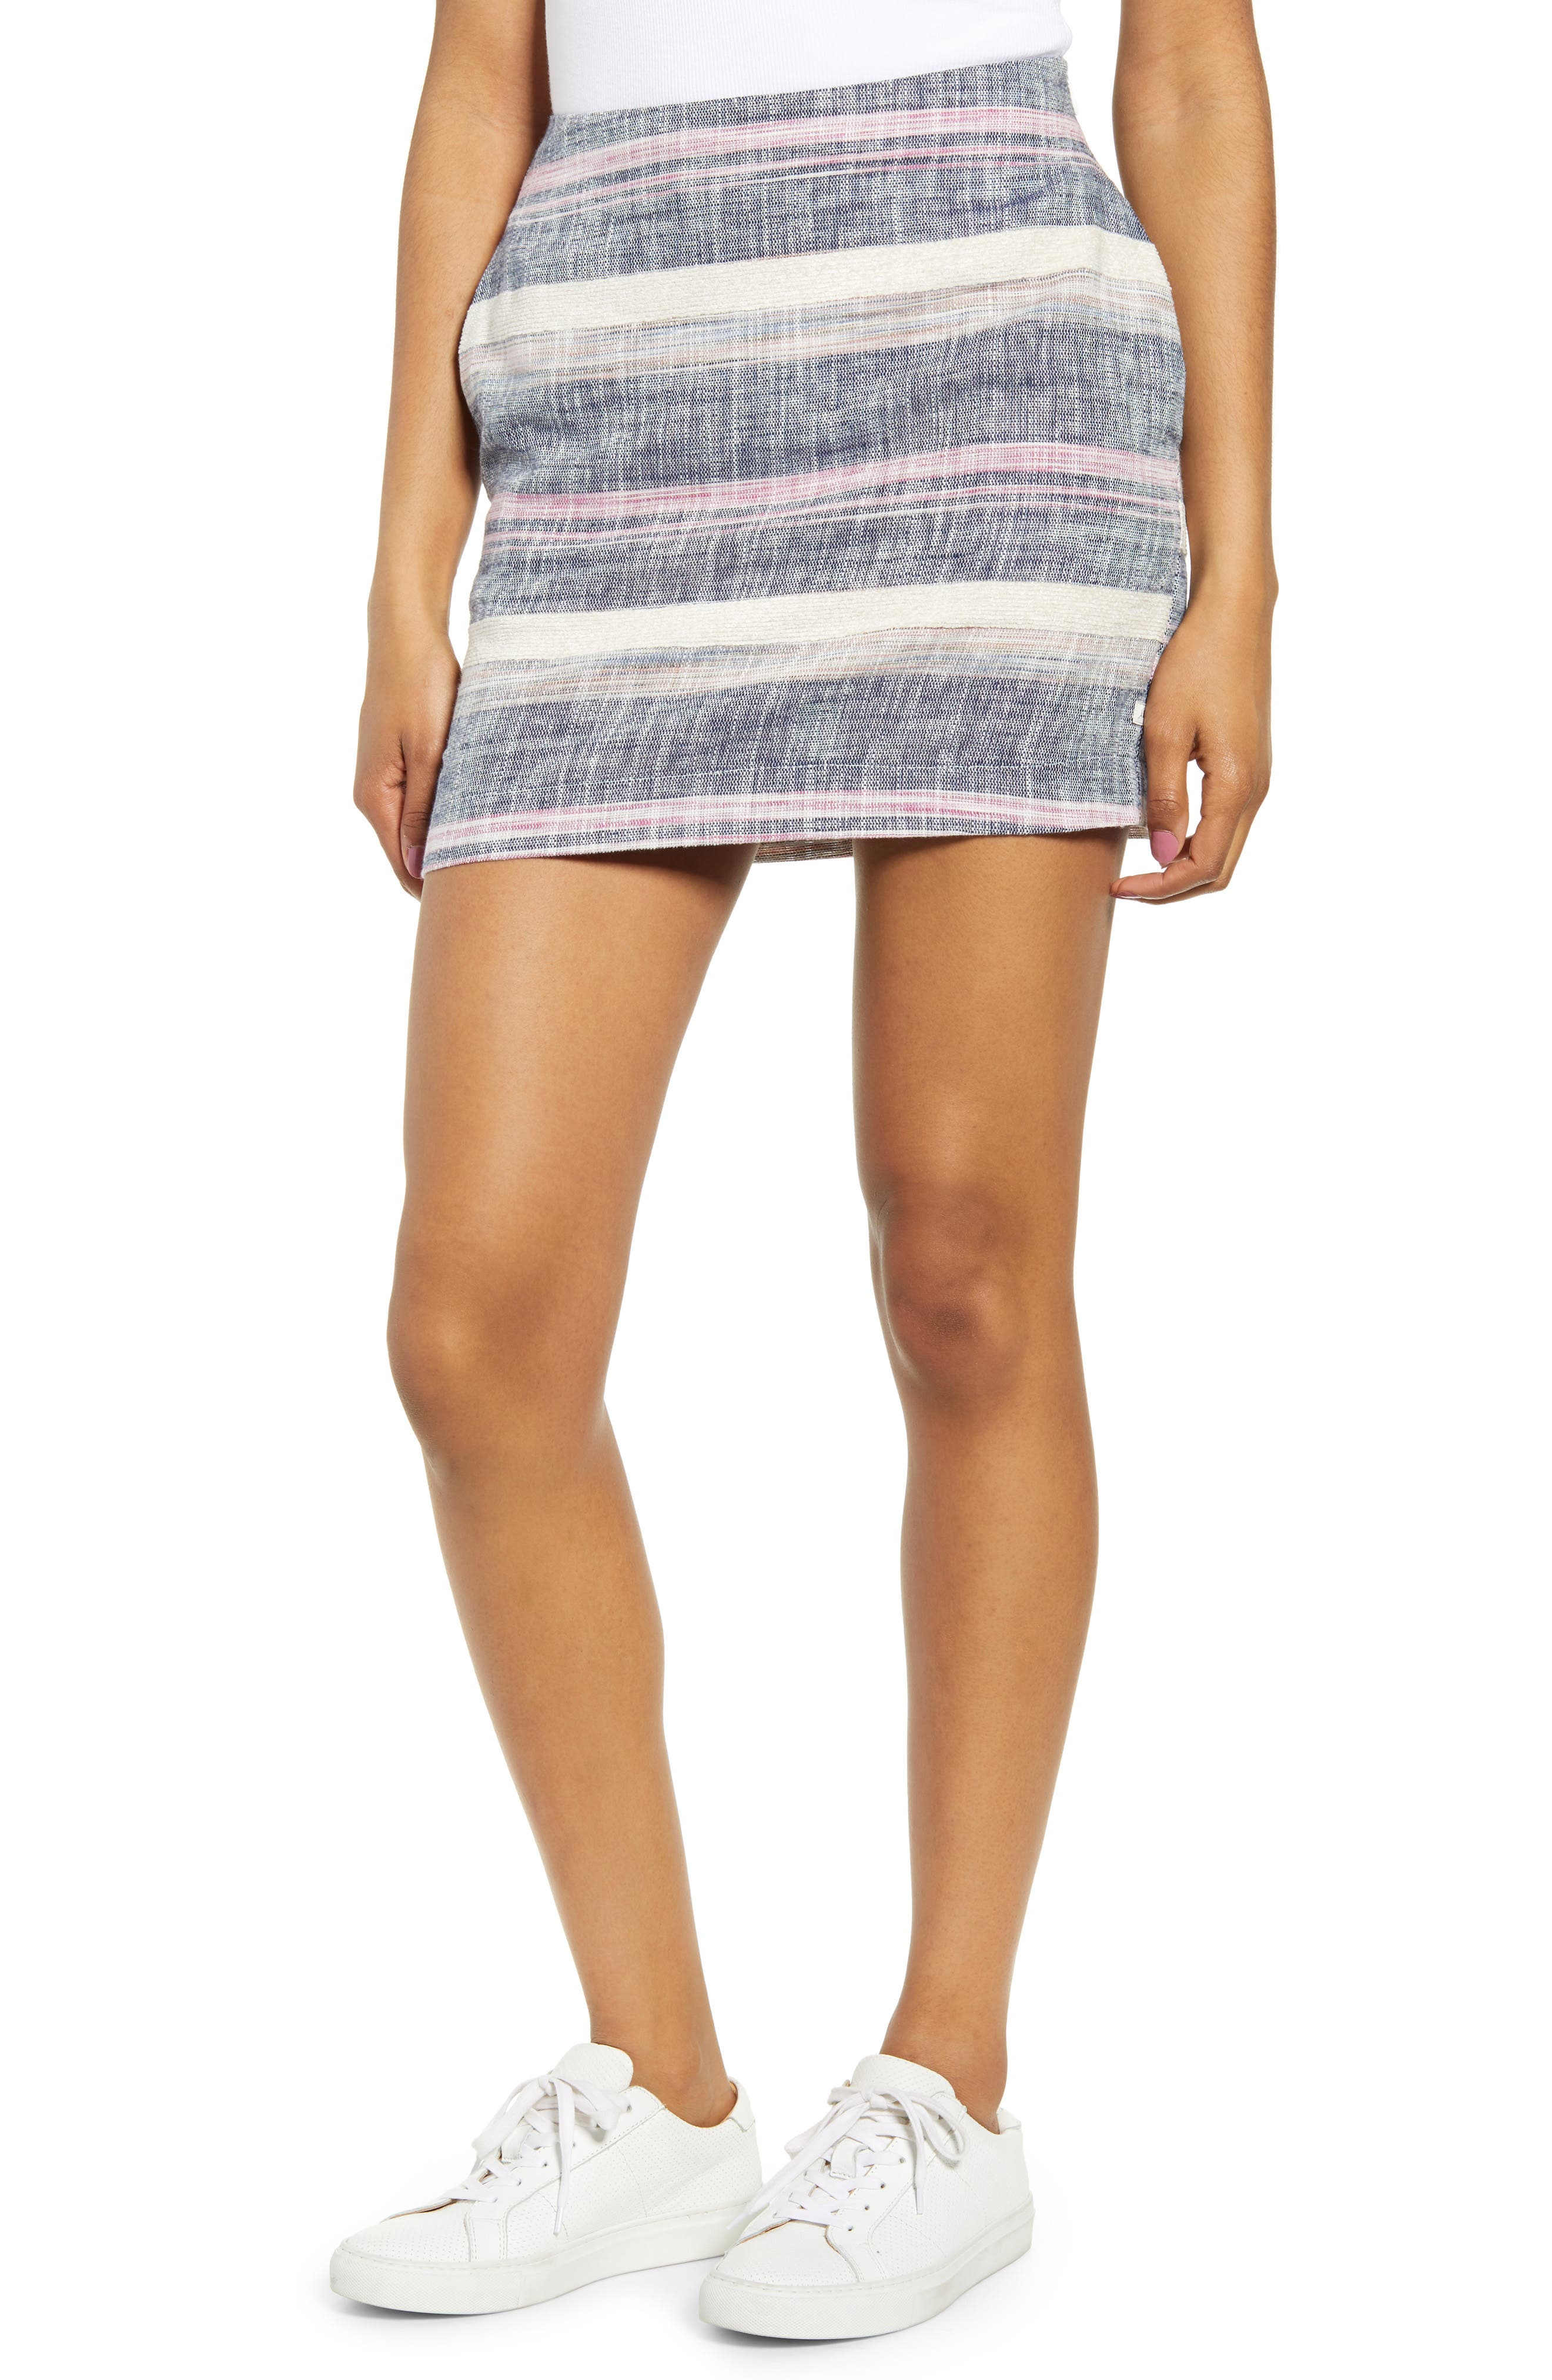 Lira Clothing Ensenada Miniskirt, Blue